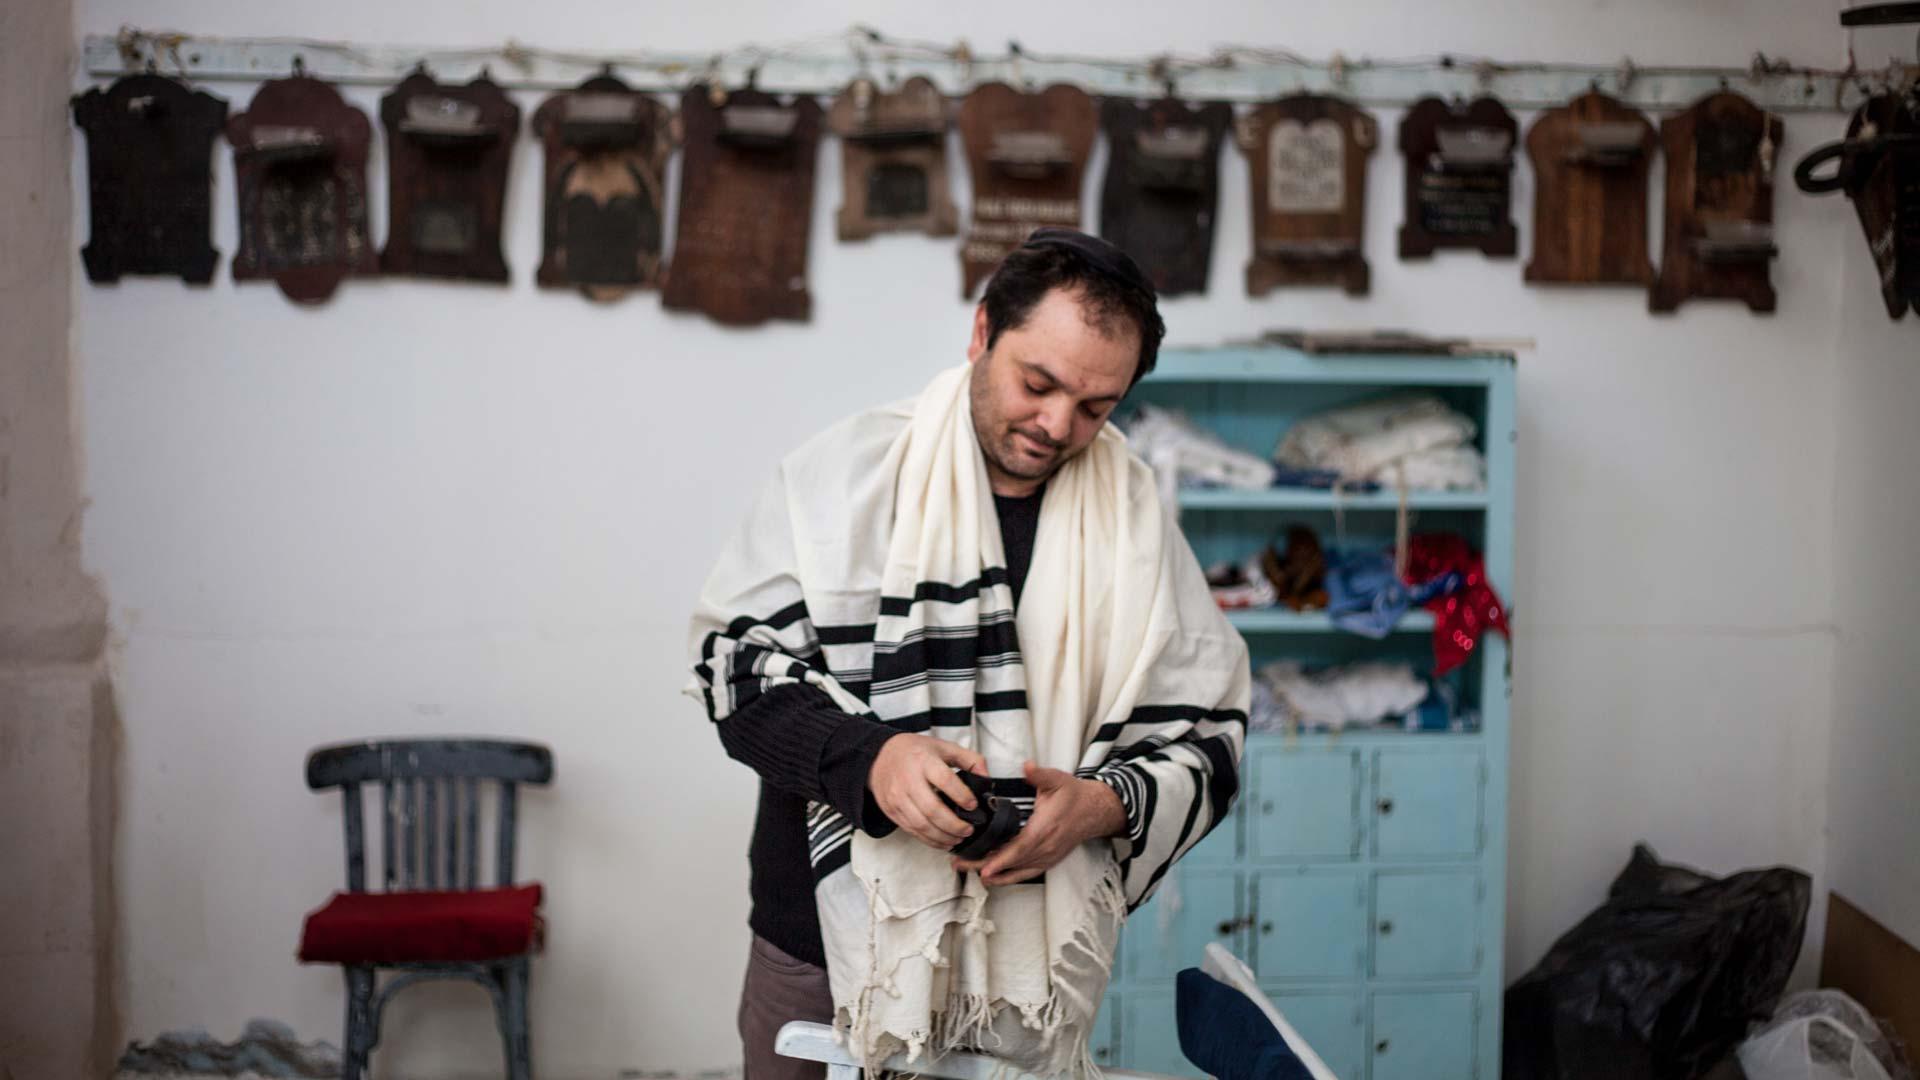 02-portrait-yves-tunisien-juif-priere2-inkyfada